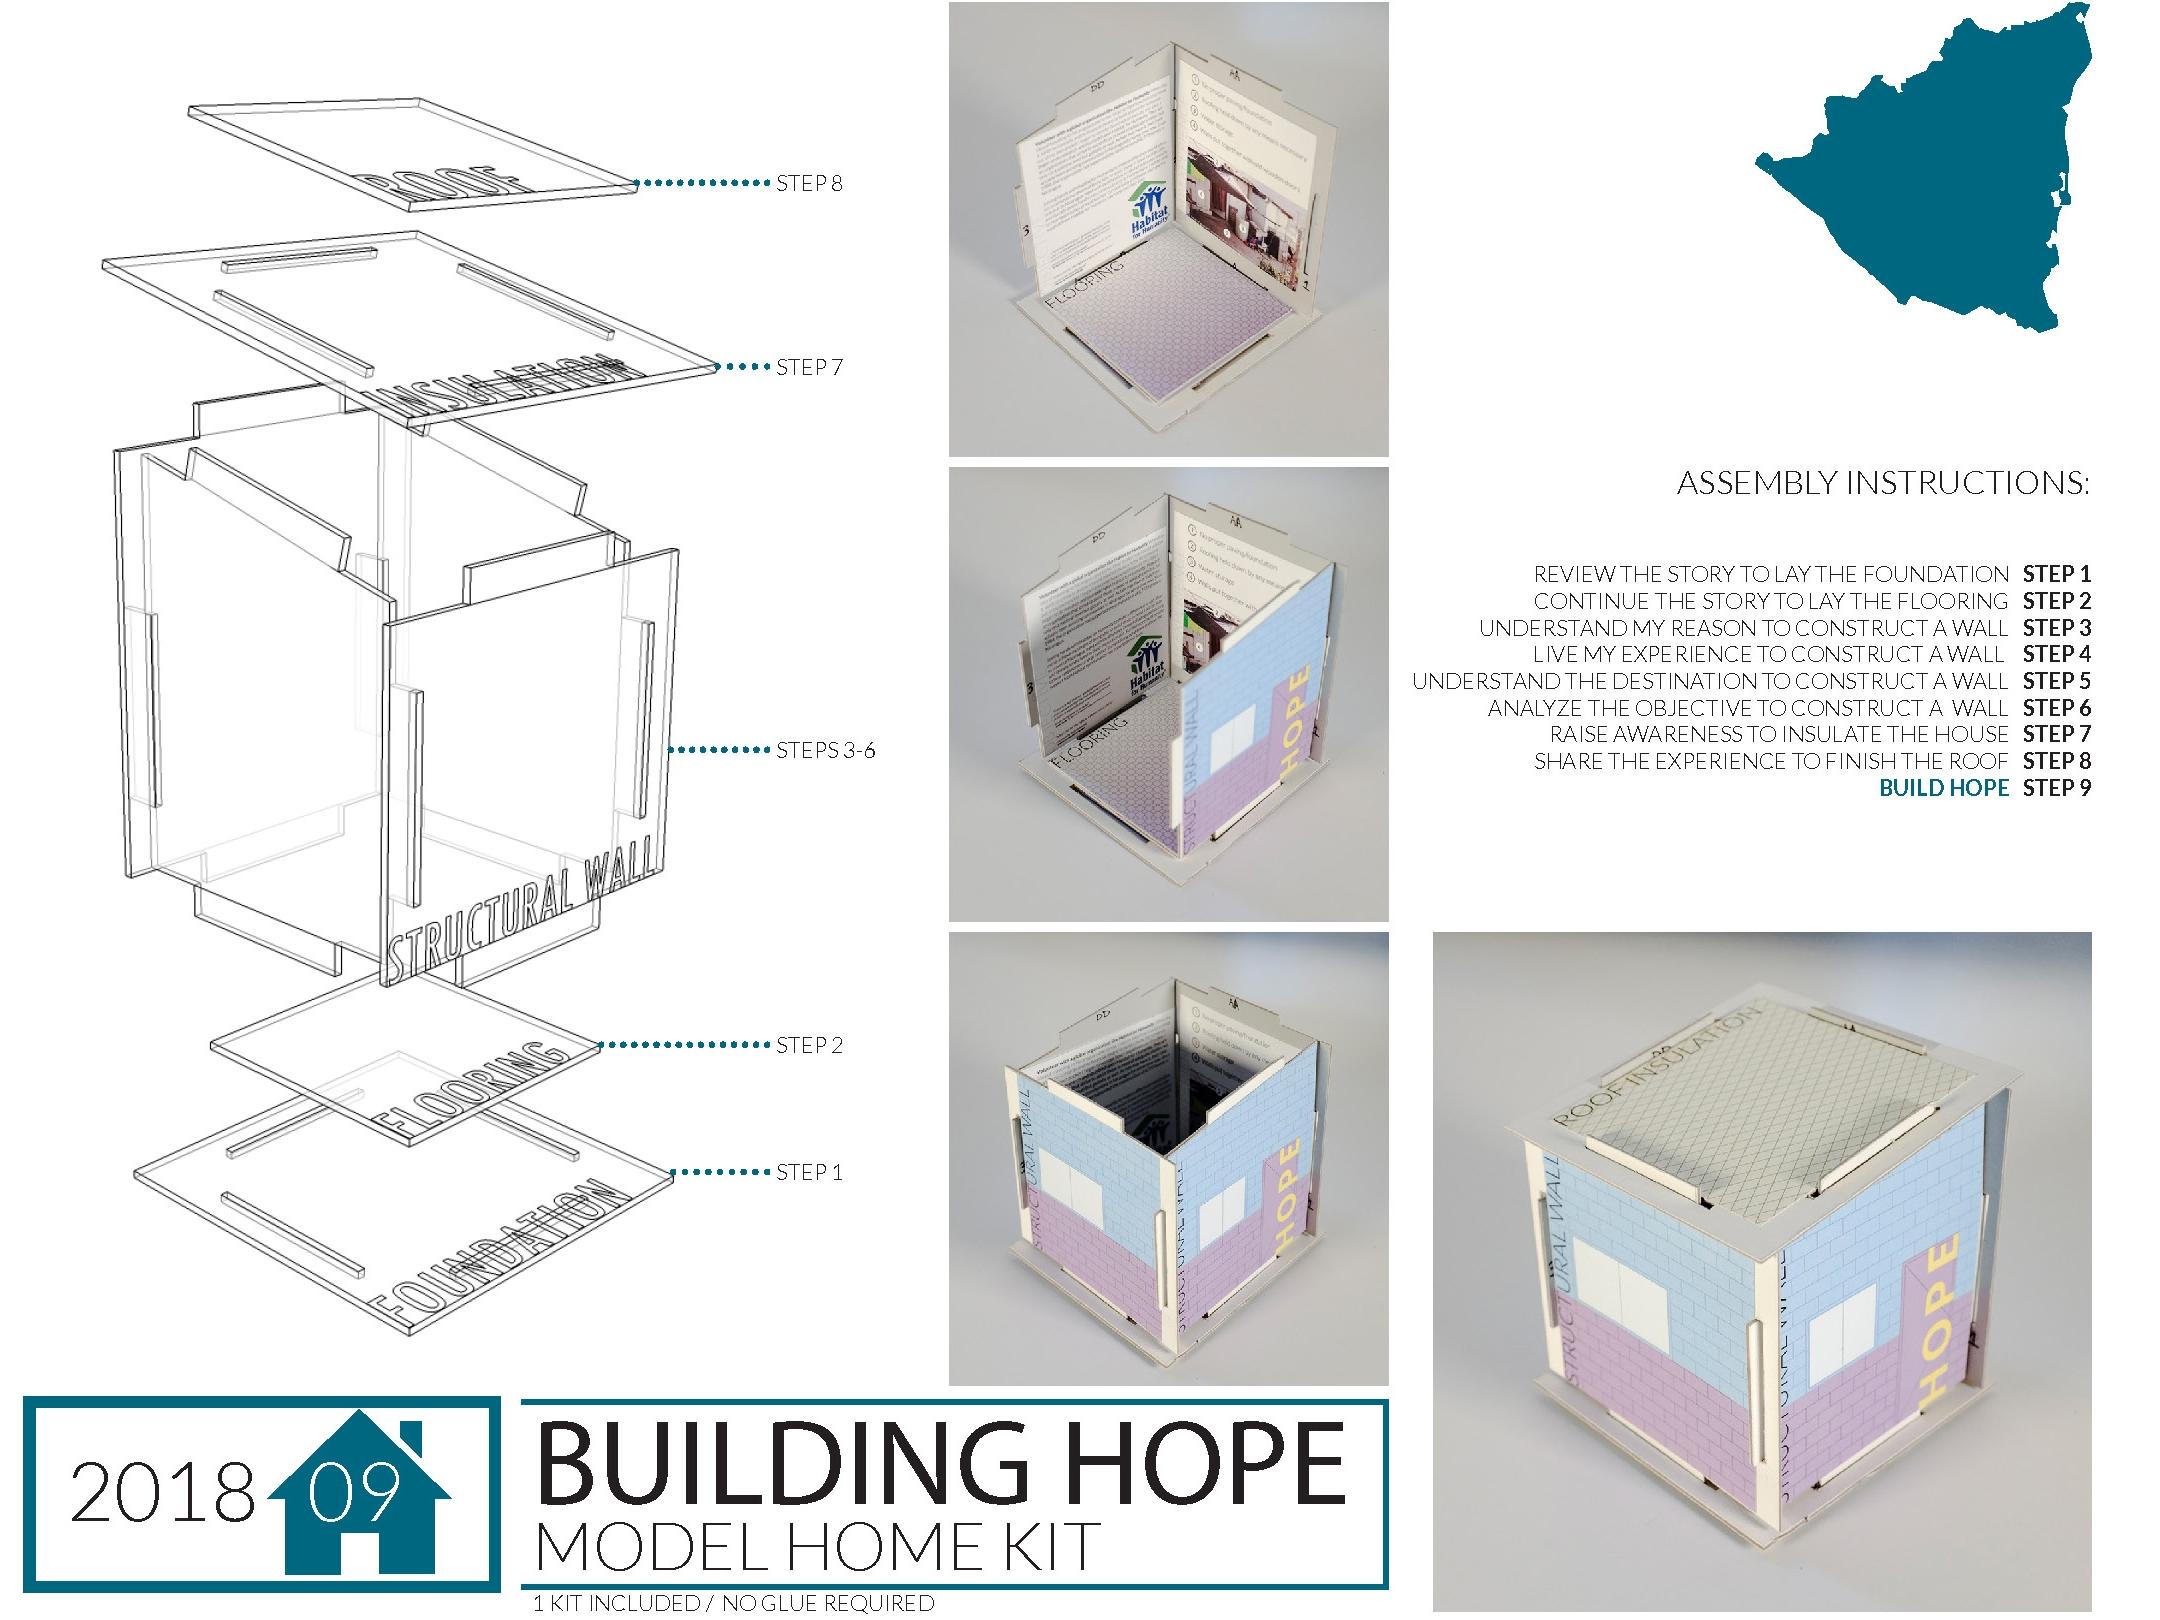 Building Hope - Nicaragua | 201809